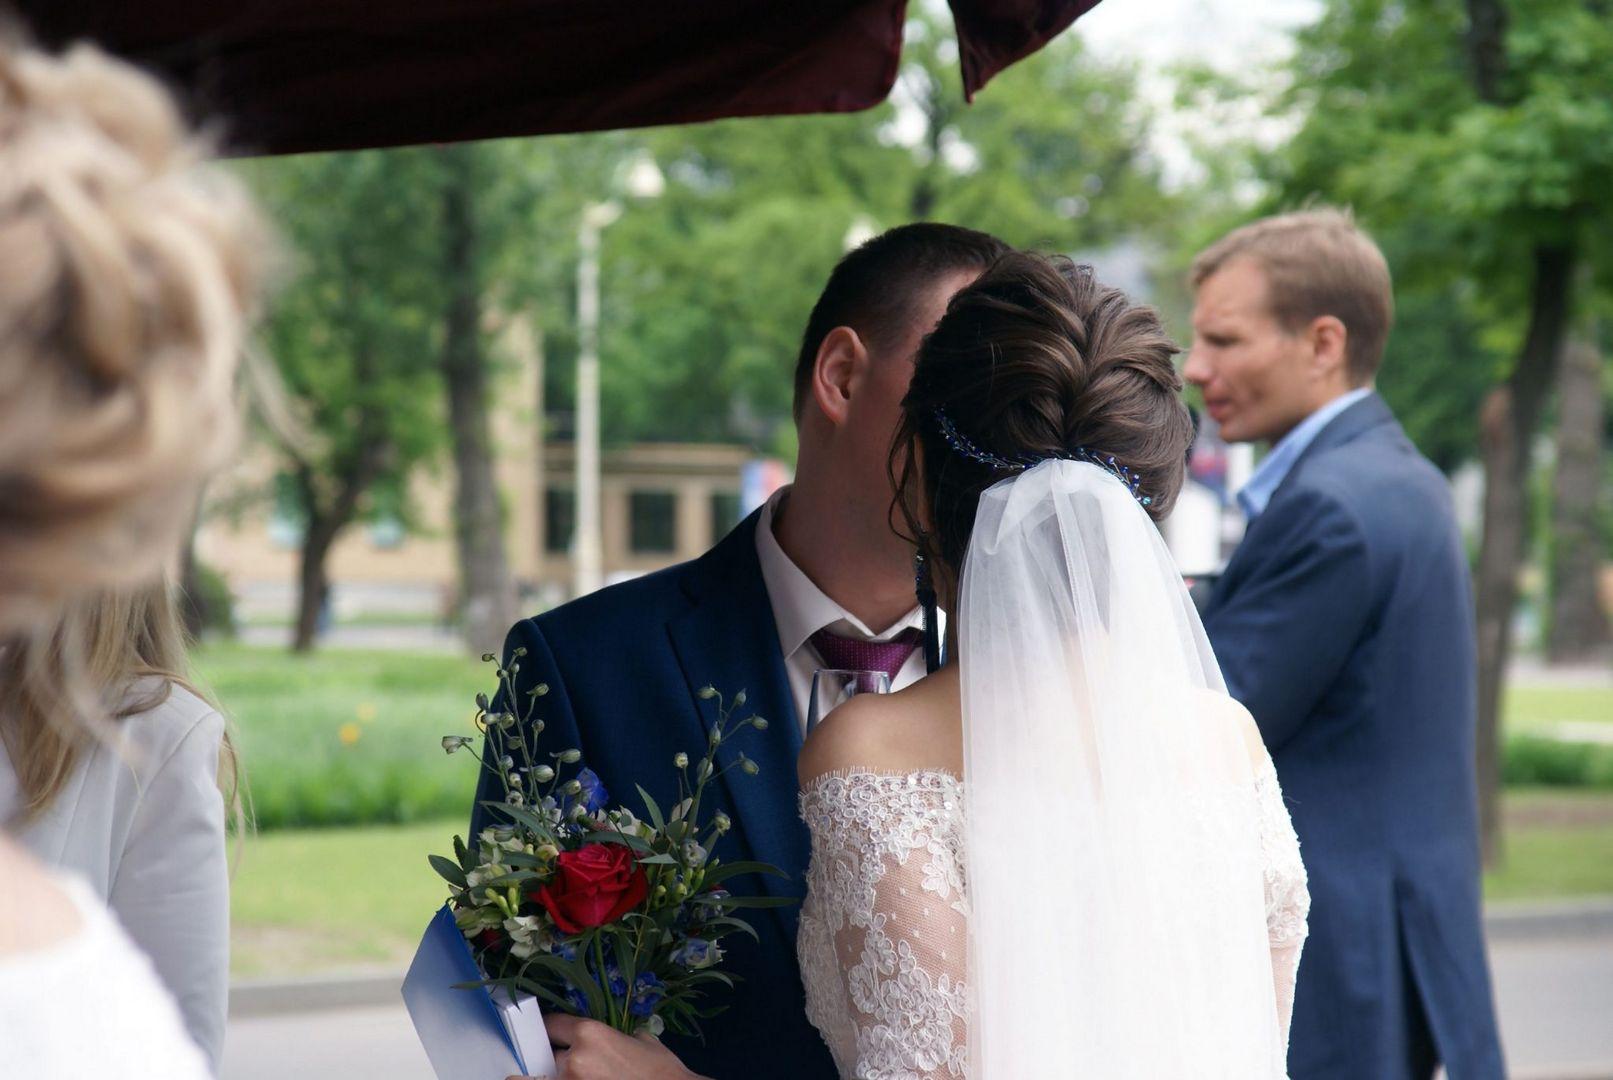 свадьбы, измены